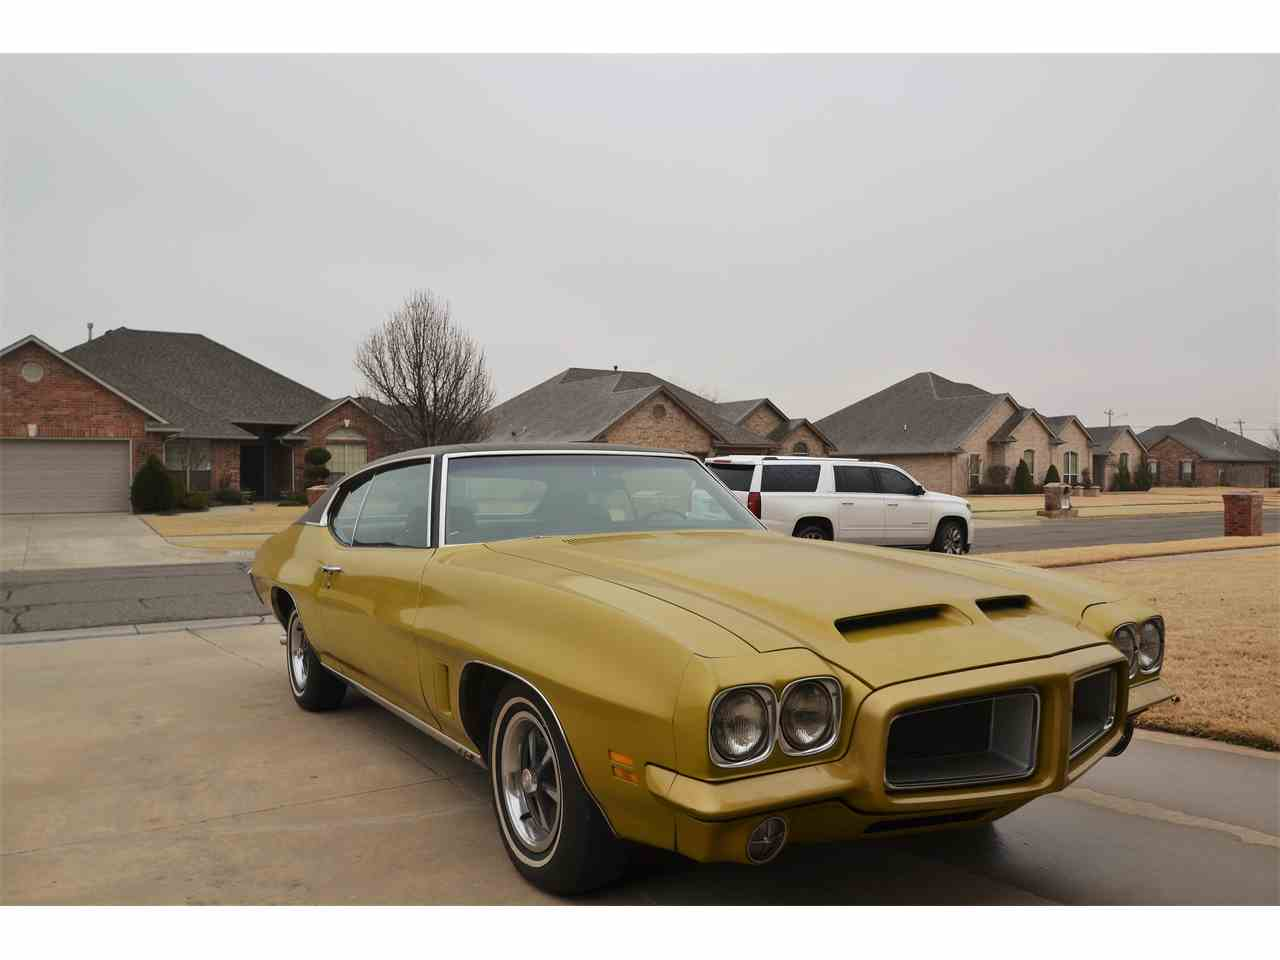 Classic Pontiac Lemans For Sale On Classiccars Com Available